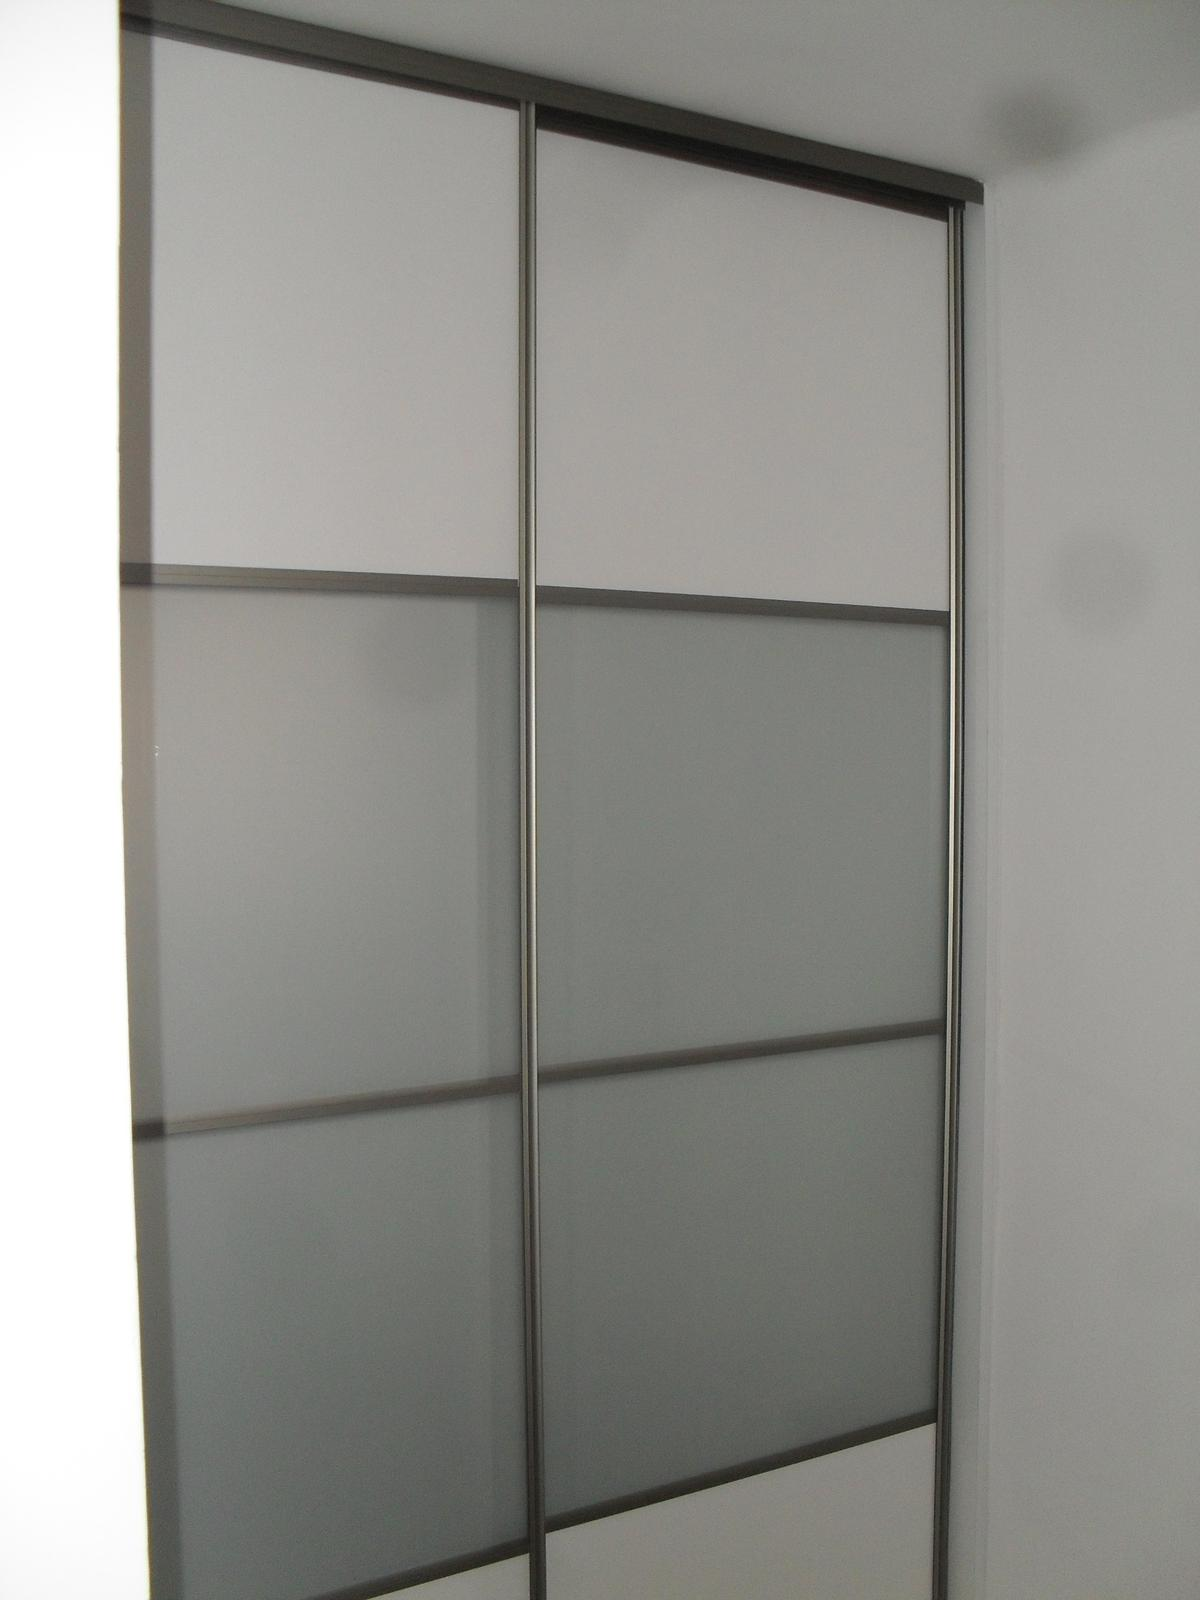 Vstavané skrine Martin Benko Bošany - Obrázok č. 86